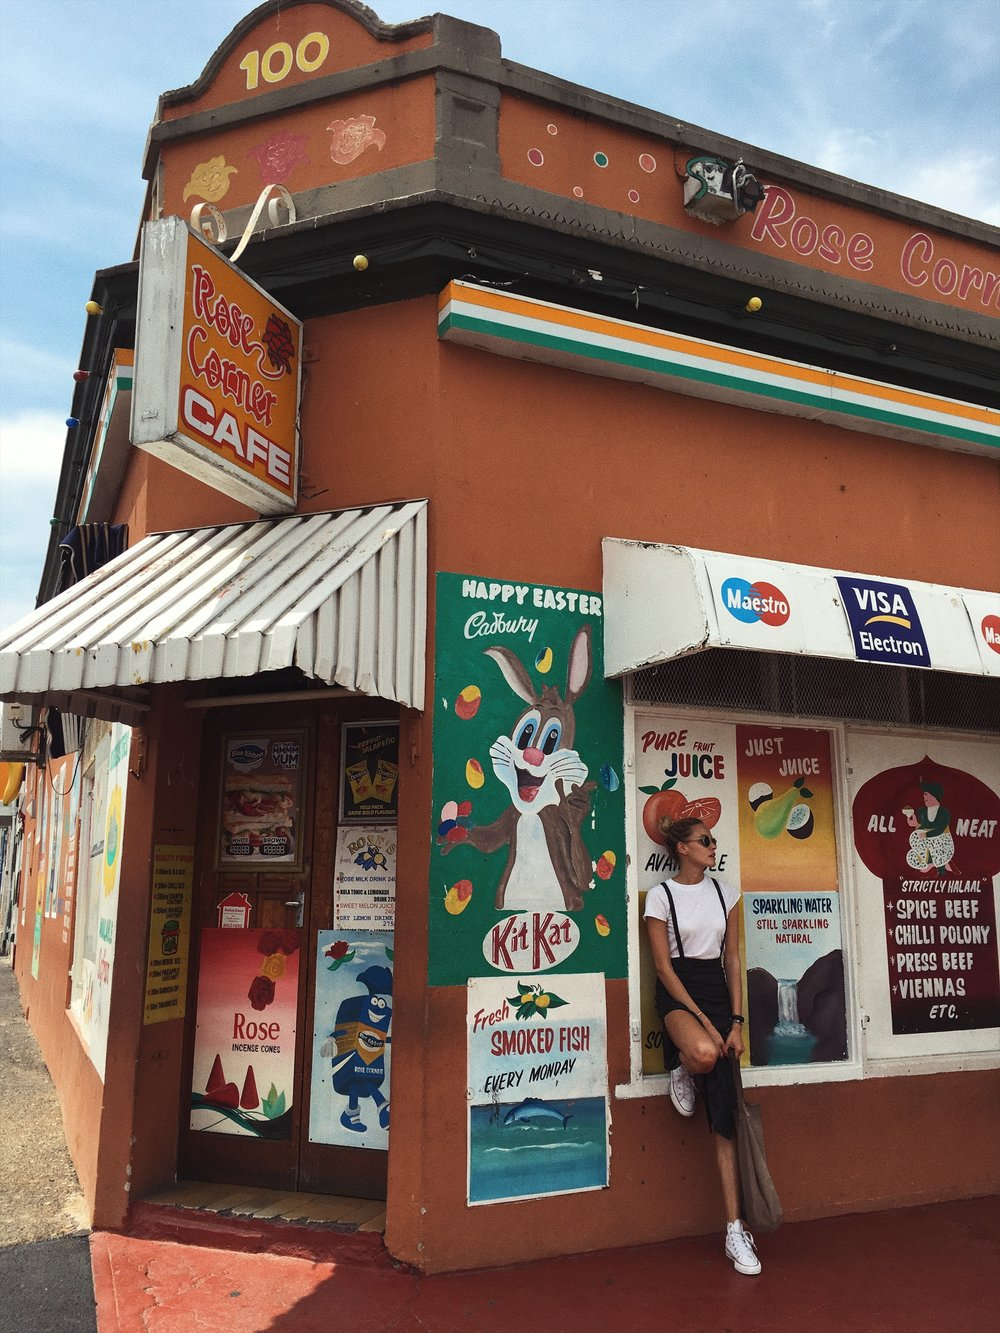 The famours rose corner cafe at Bo Kapp